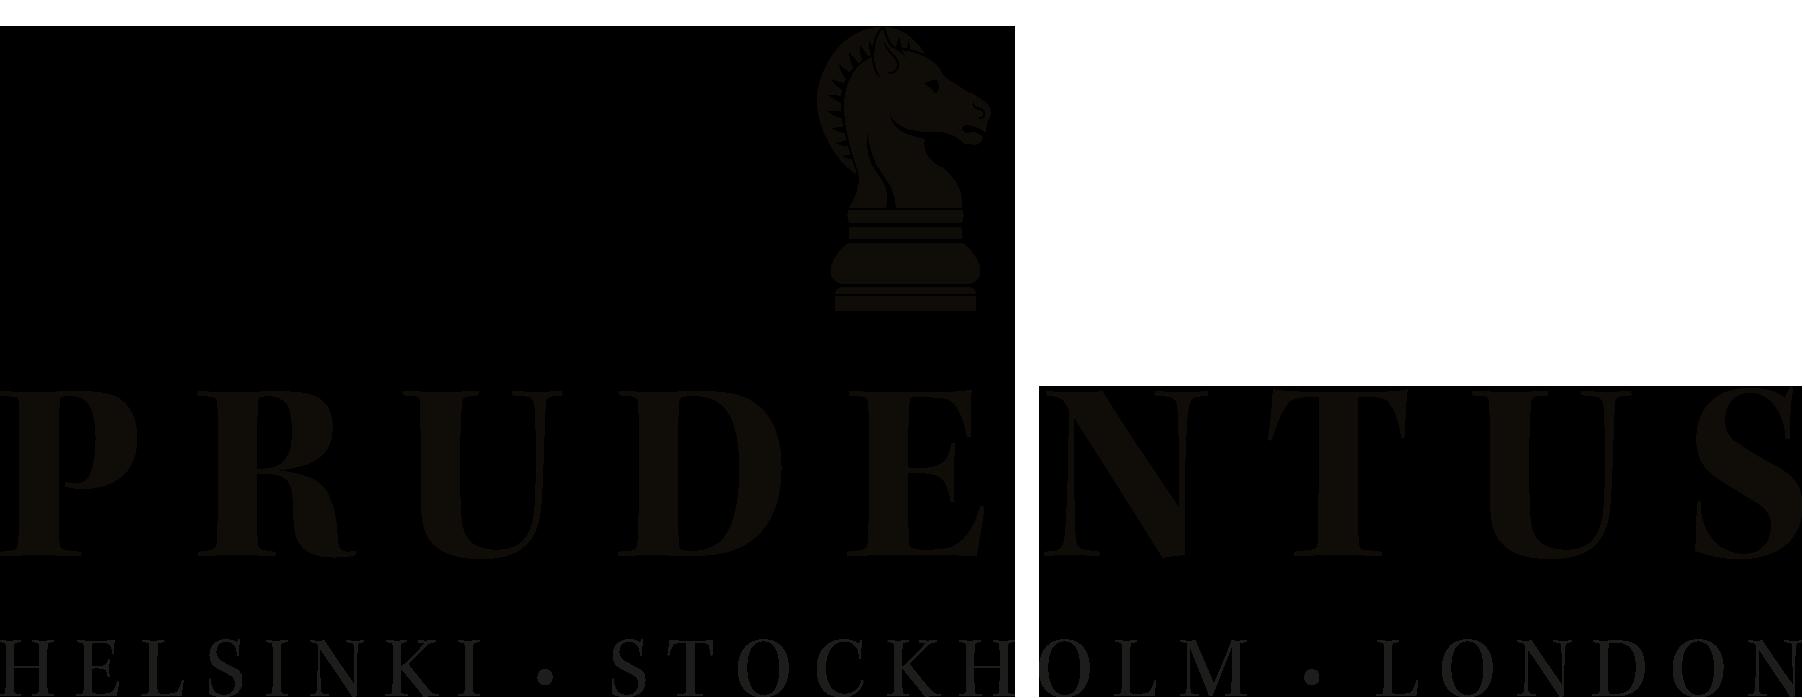 Prudentus Helsinki Stockholm London